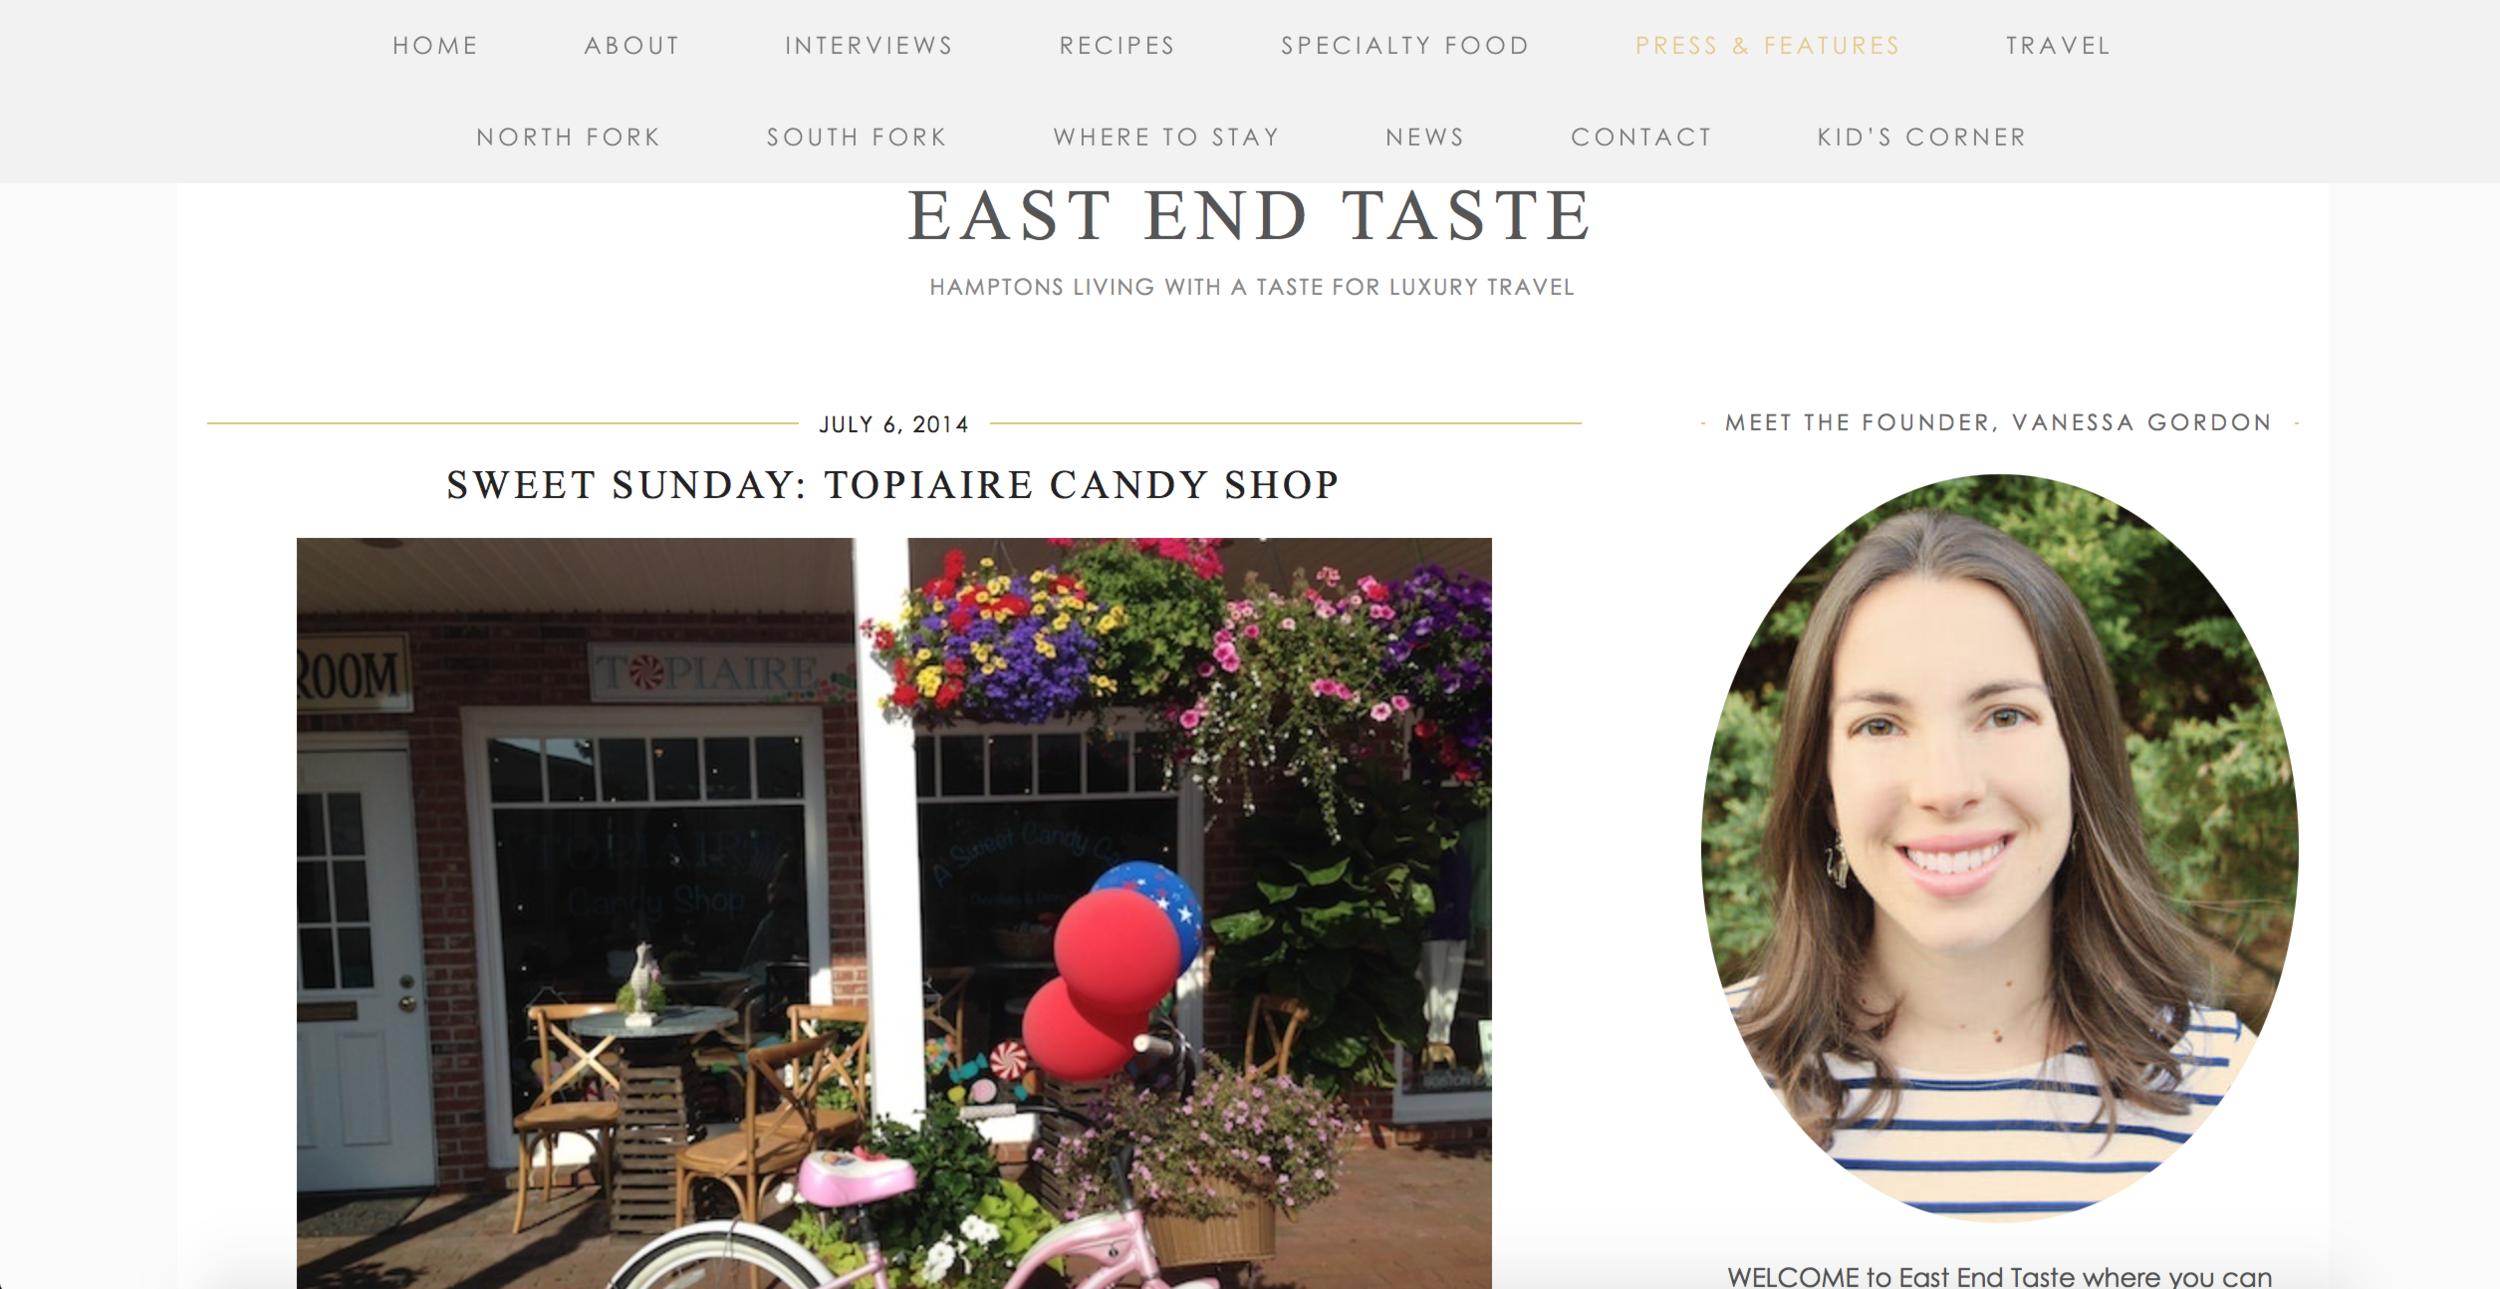 Article: East End Taste